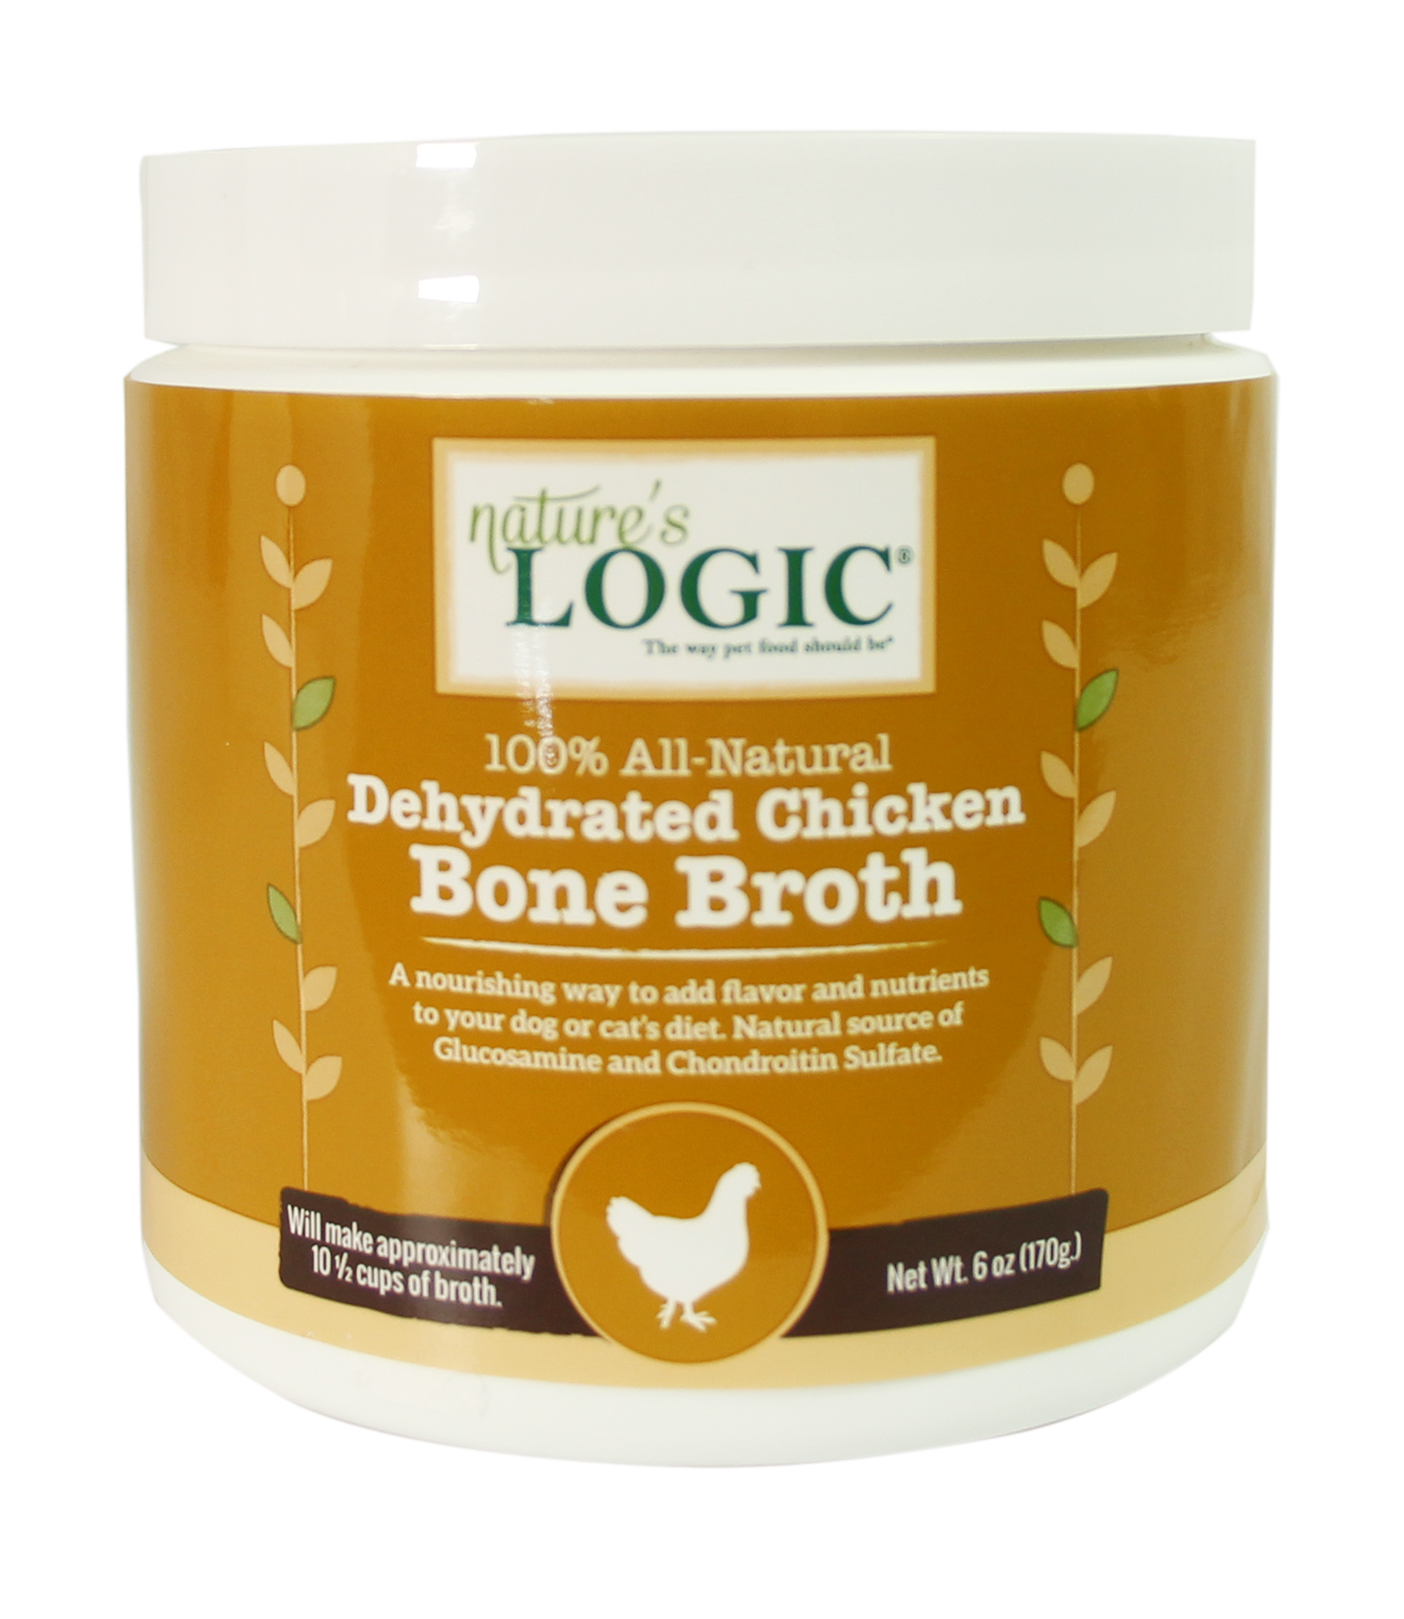 Nature's Logic Nature's Logic Dehydrated Bone Broth Chicken 6oz